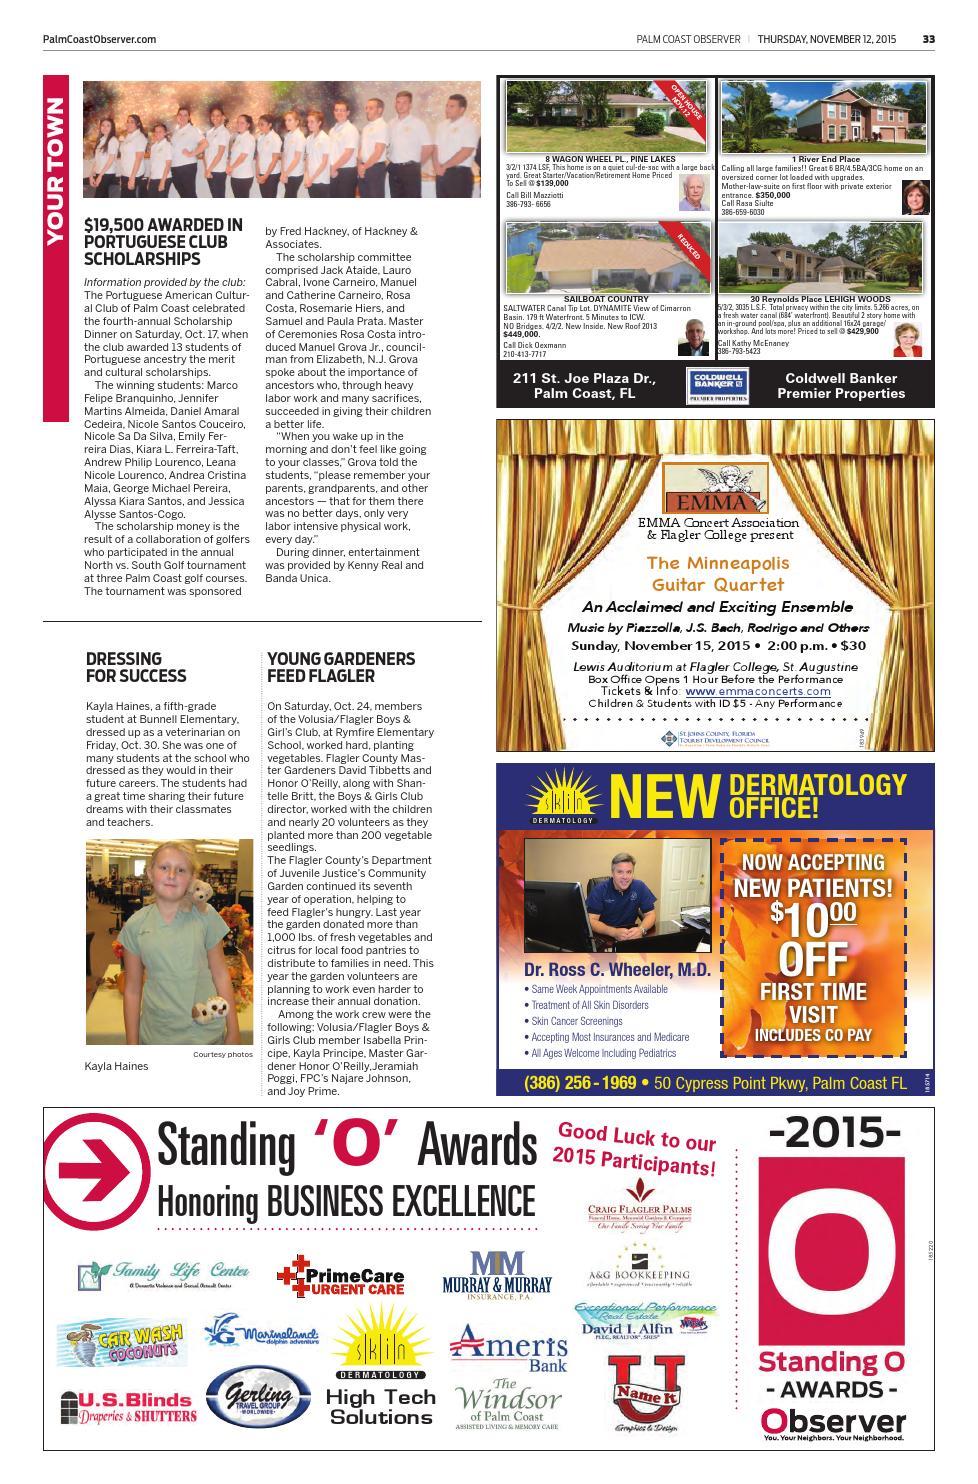 Palm Coast Observer Online 11-12-15 by Brian McMillan - issuu